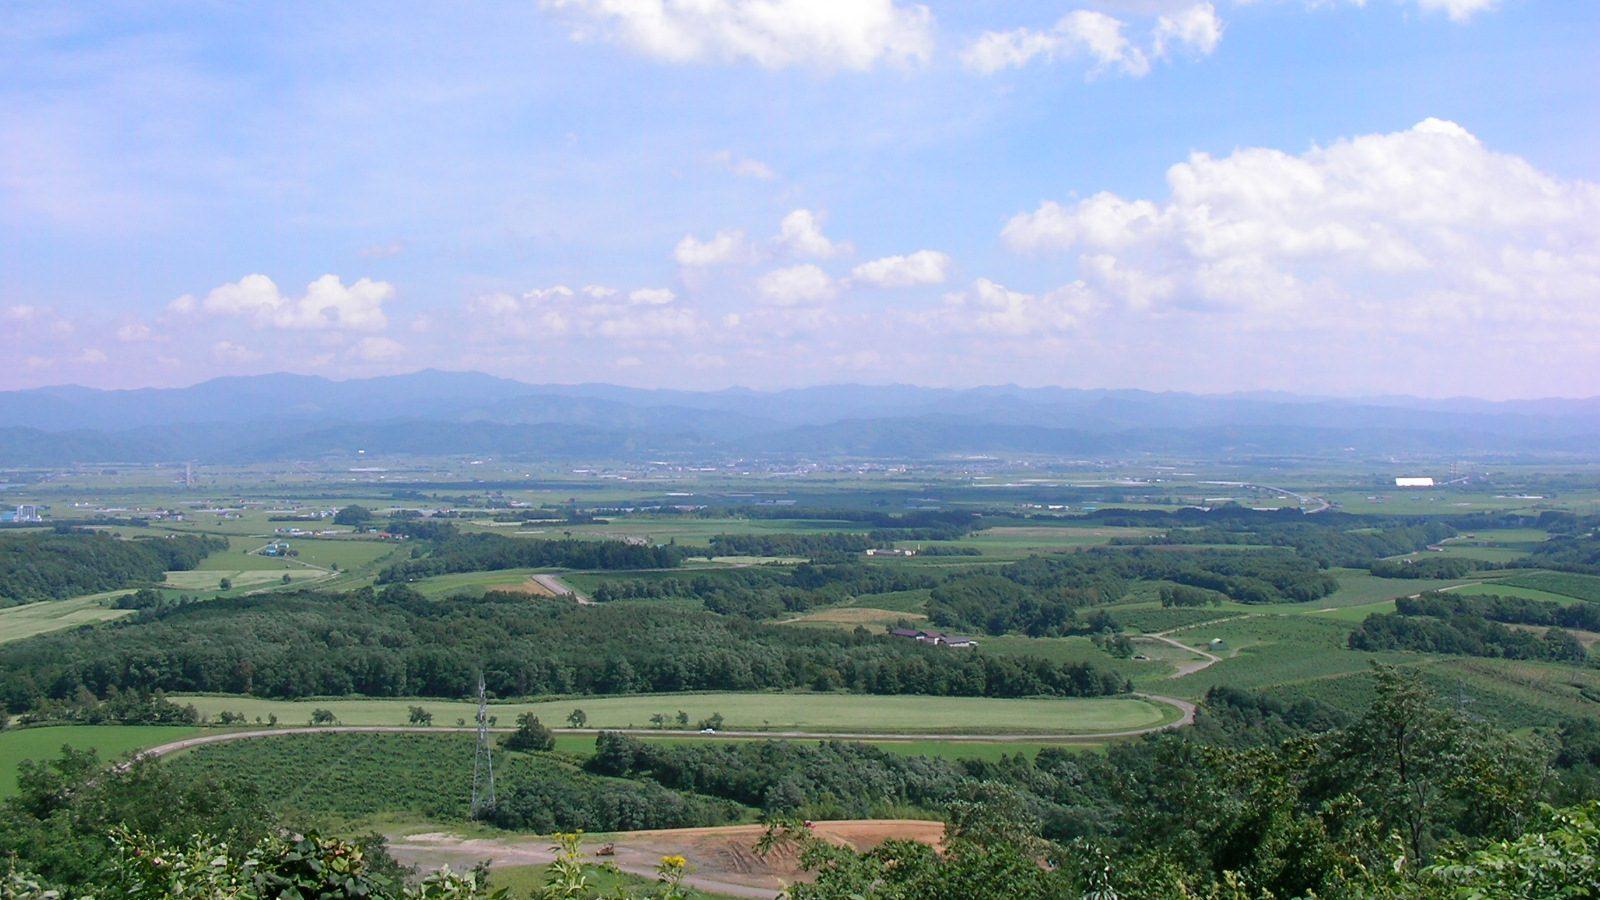 Urausu: Sorachi's Good Picnic Spot